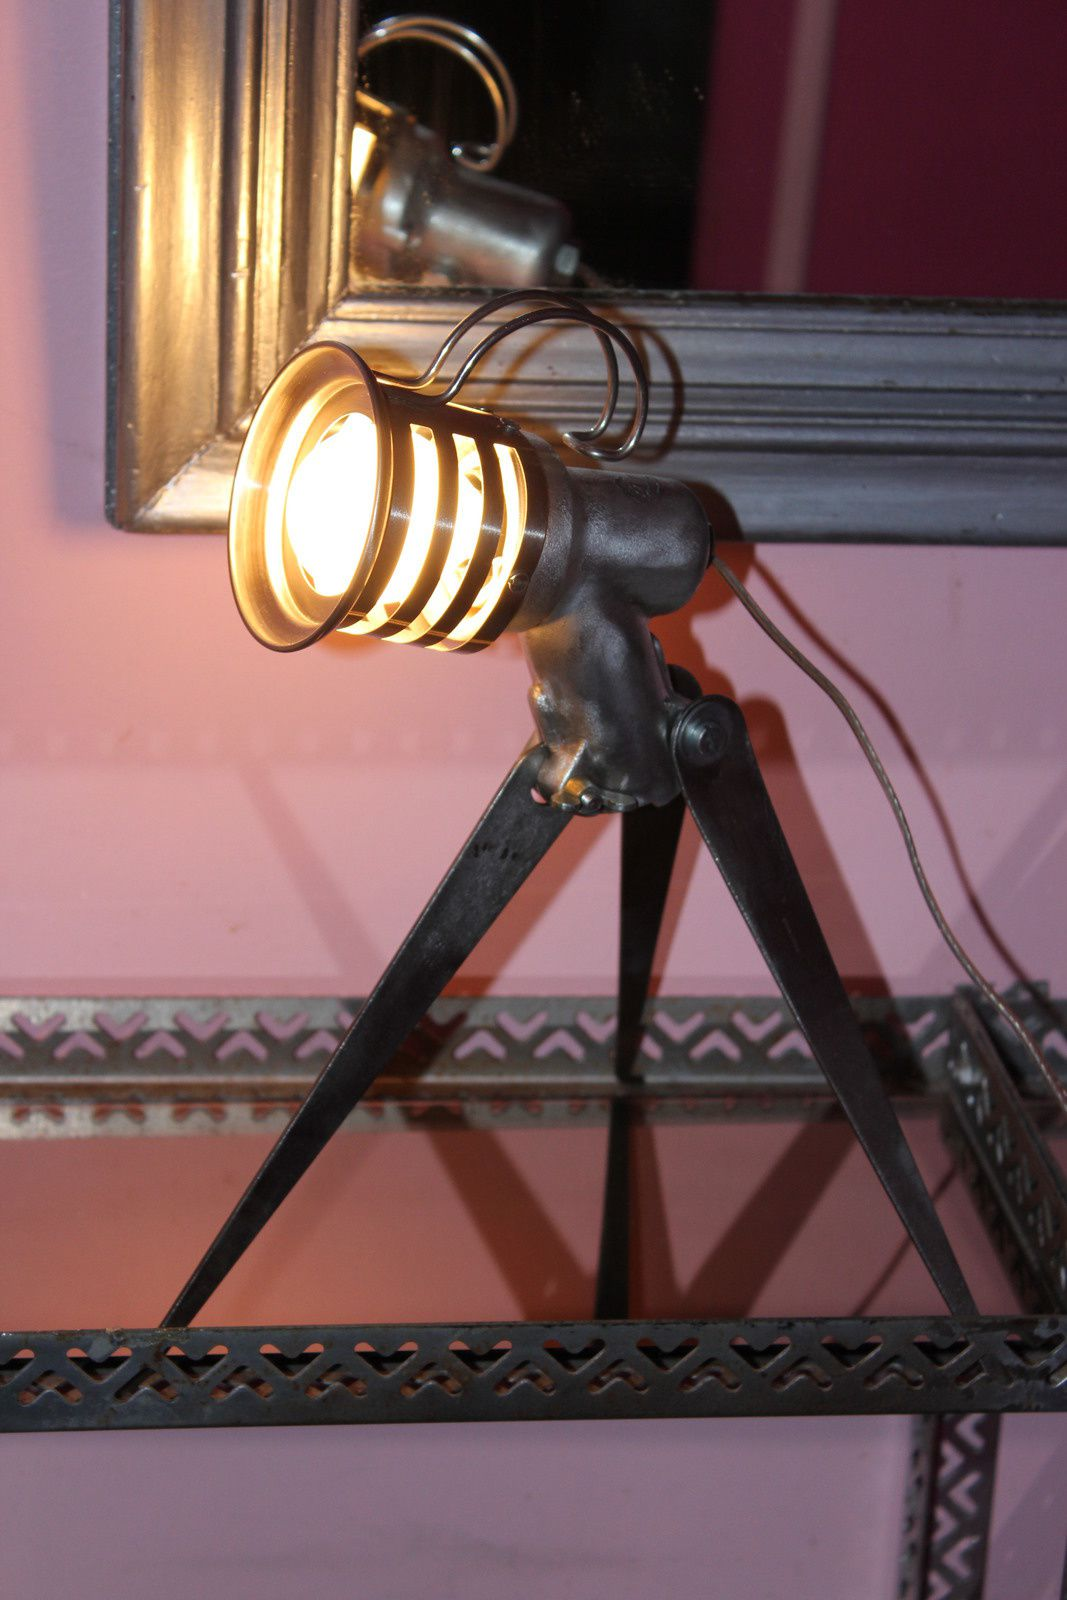 objet de recuperation lampe cr er en m tal de r cup ration et objet d tourn s la. Black Bedroom Furniture Sets. Home Design Ideas